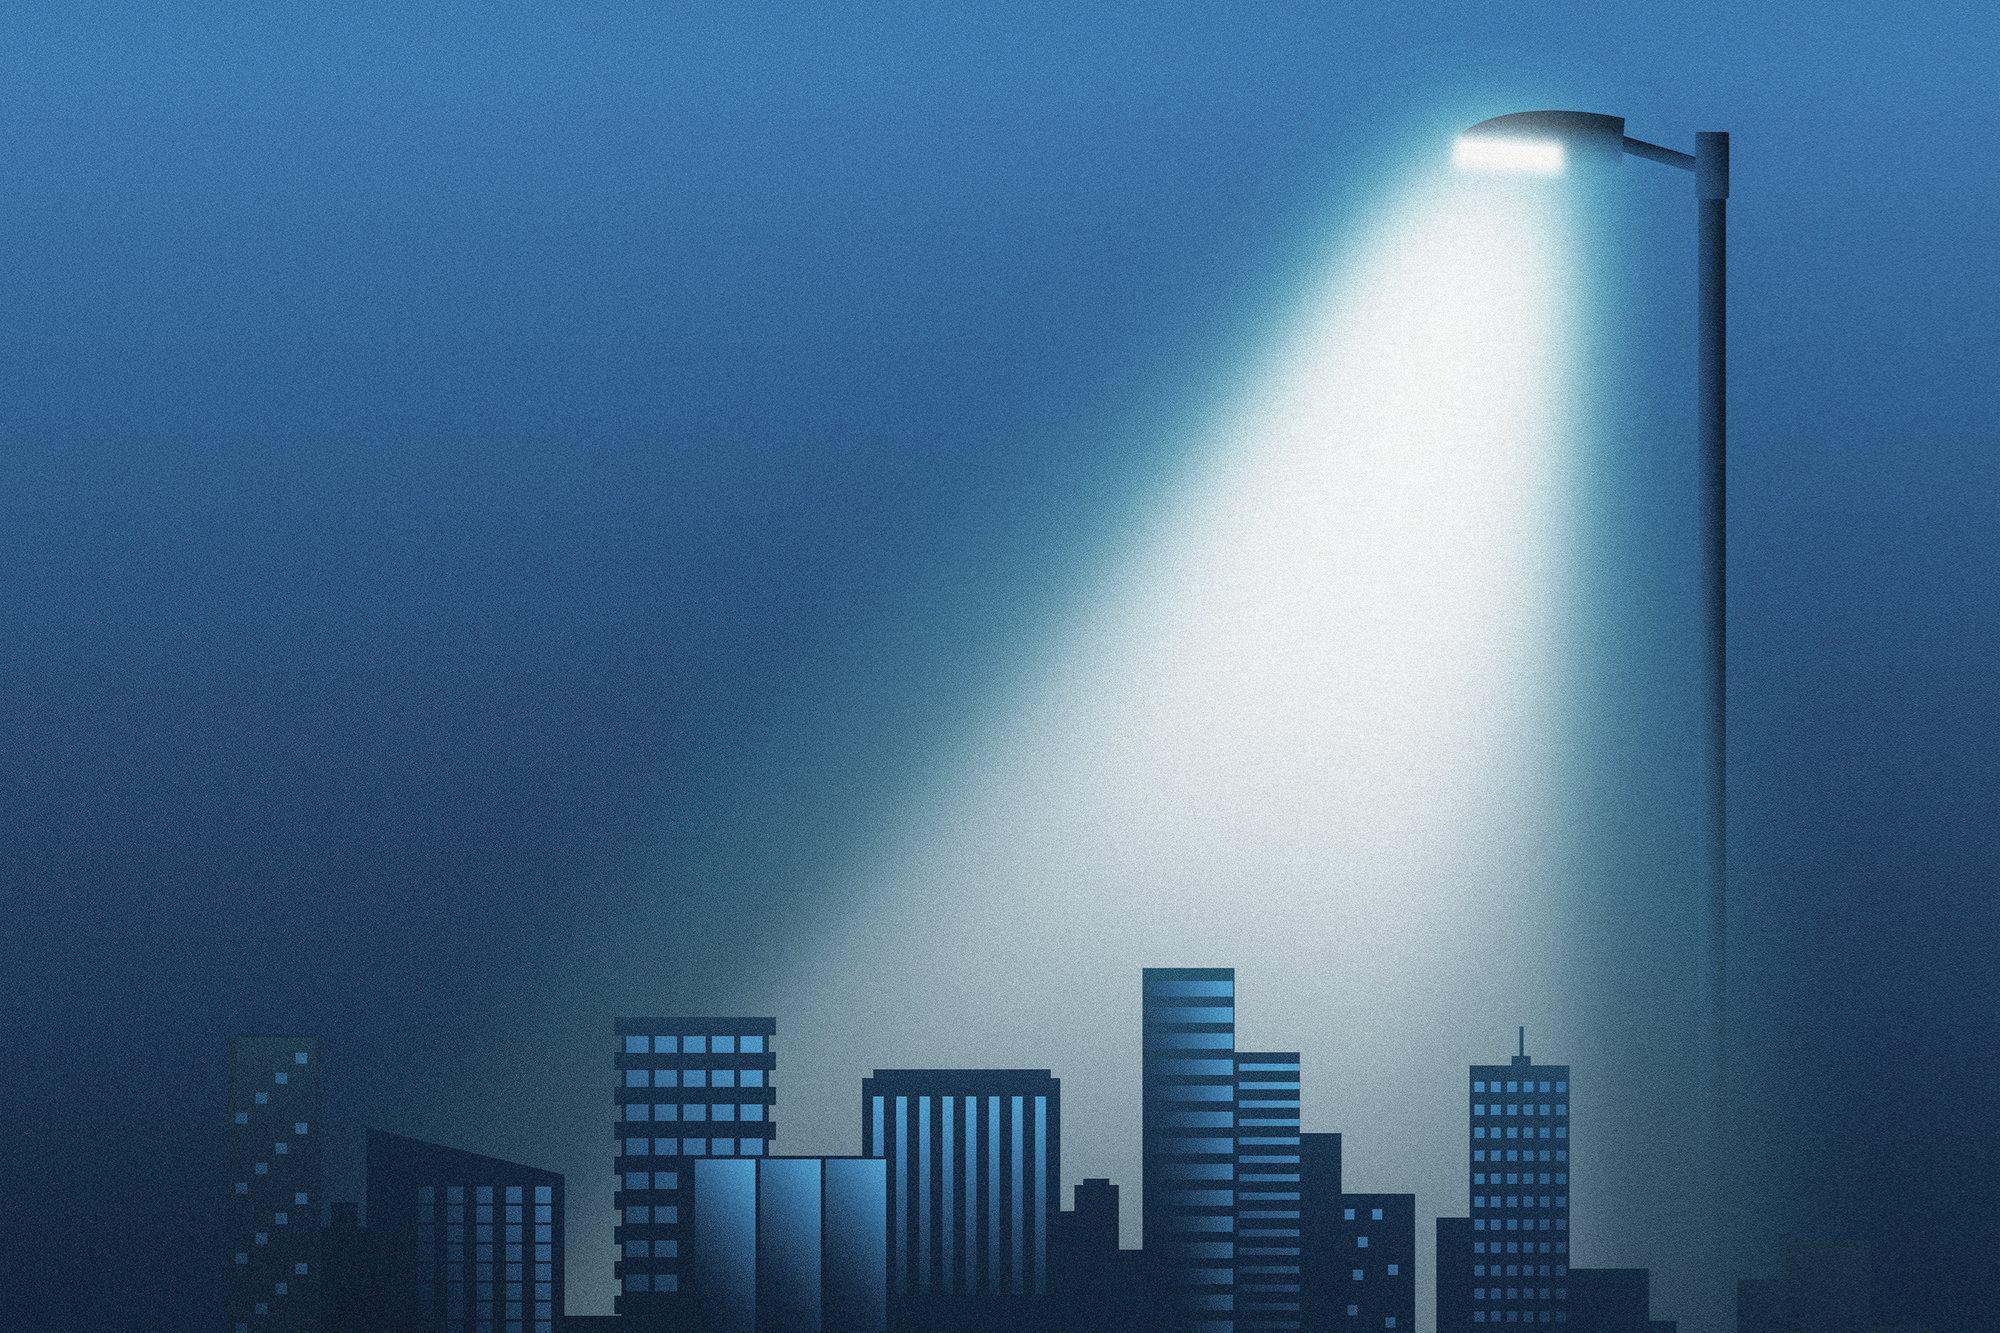 glasgow applications lighting light lights led pin street luxurious